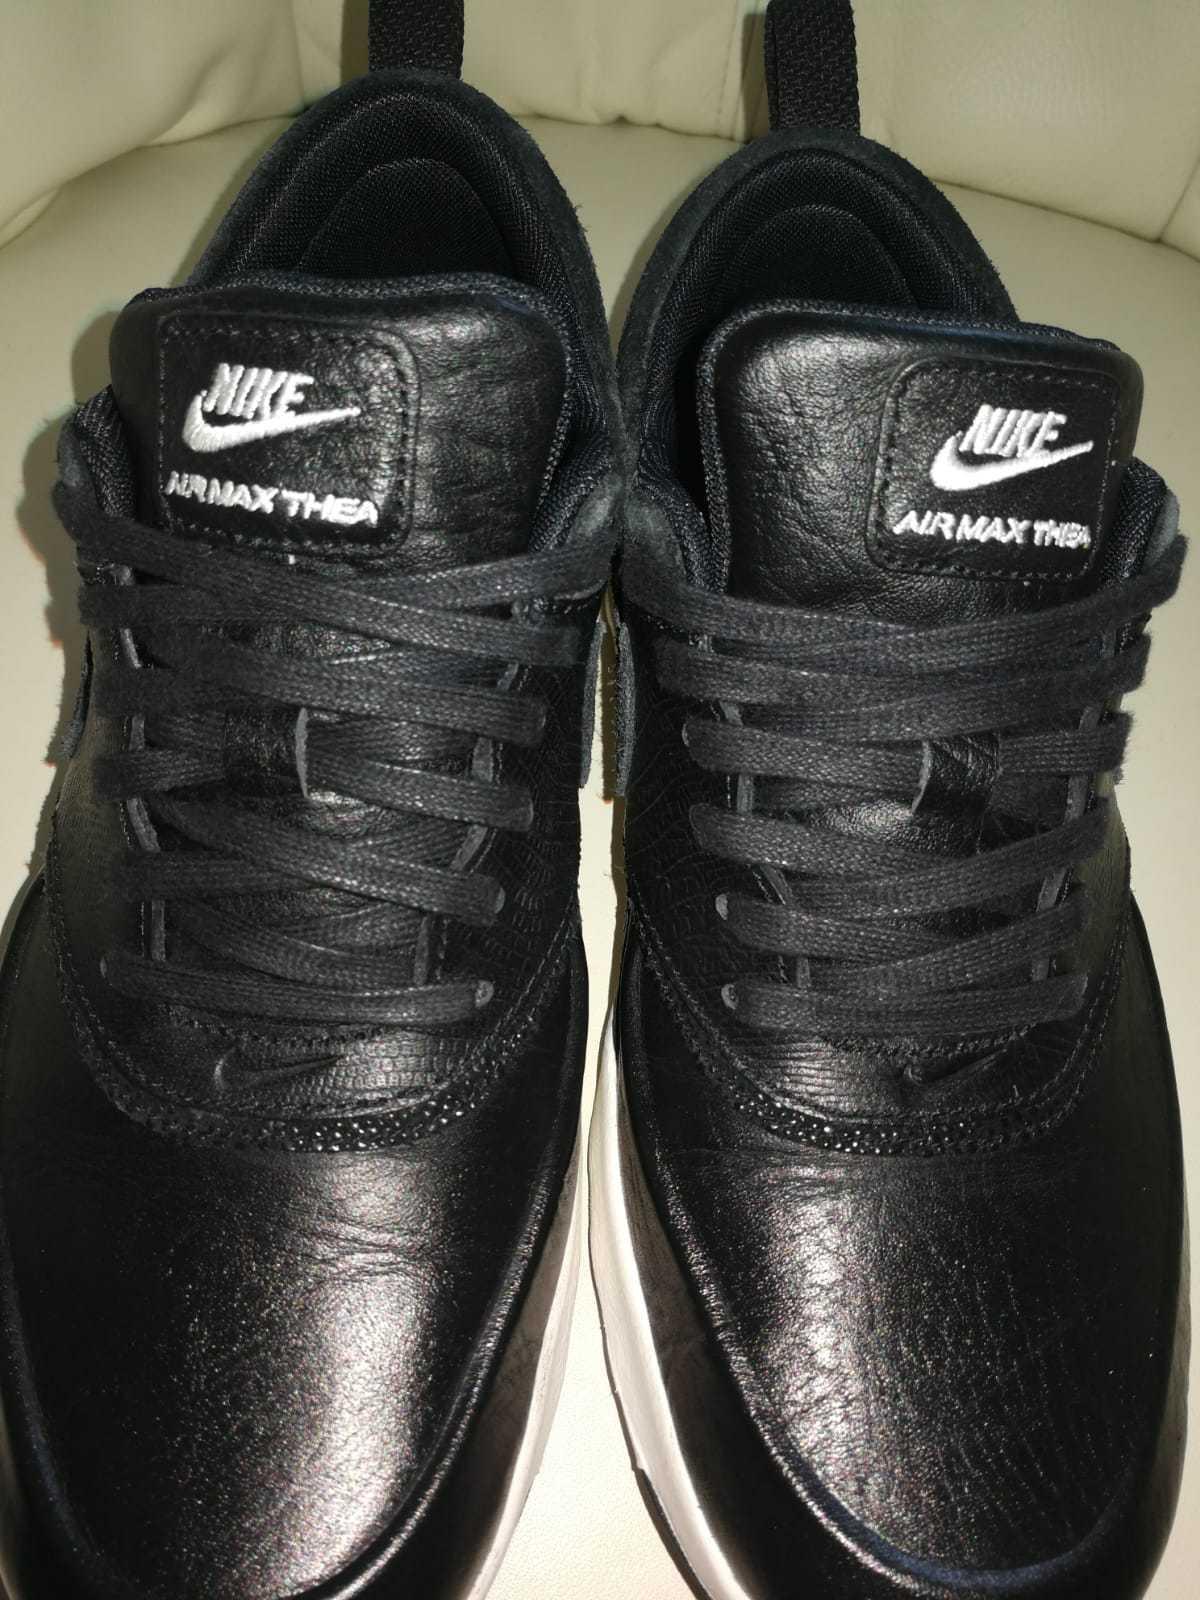 Nike Air Max Thera Thera Max Sneake-Schuhe - Leder in Schlangen Optik - NEUWERTIG - Gr. 38 47b009